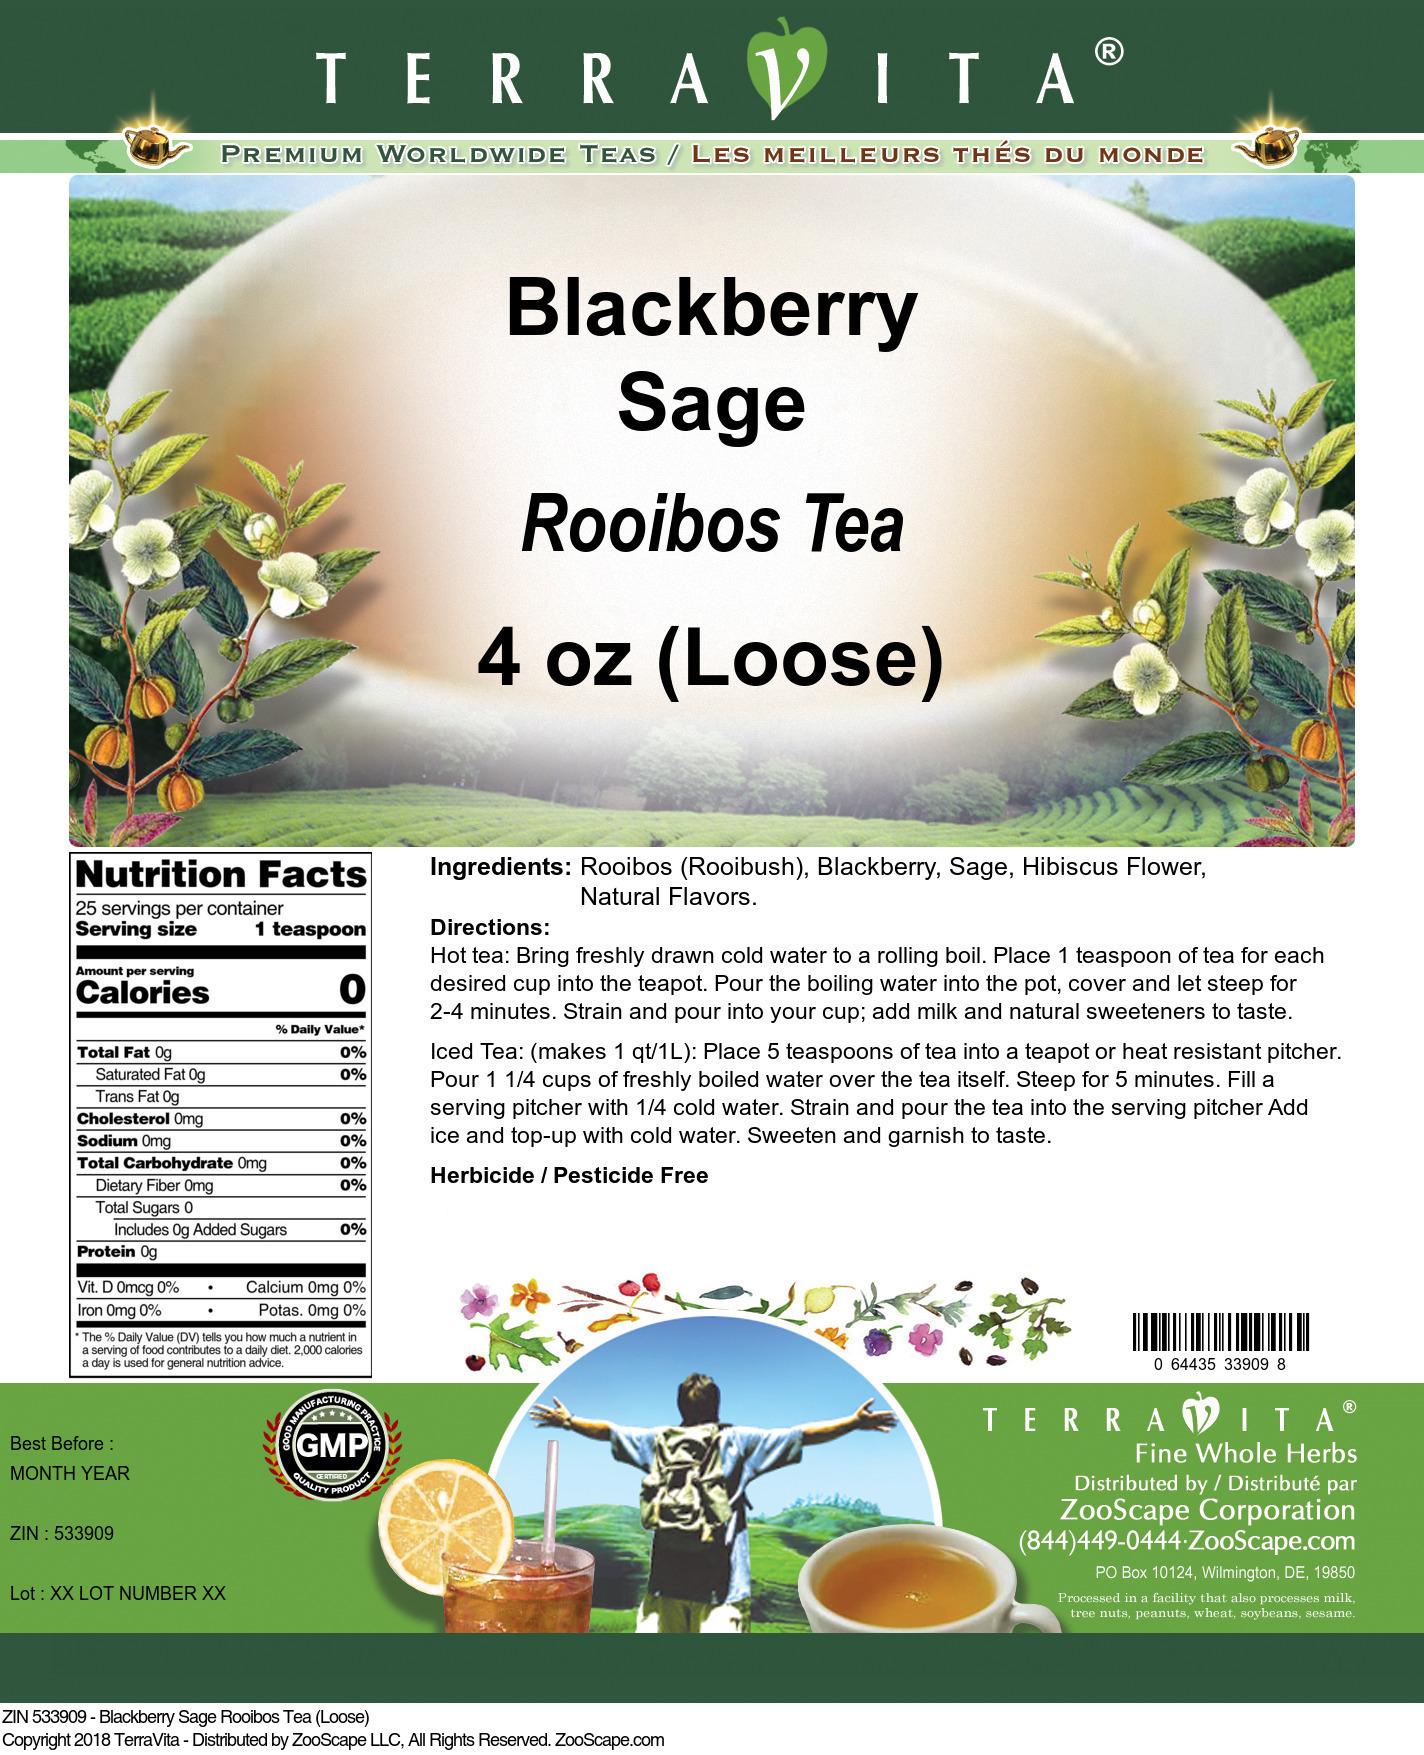 Blackberry Sage Rooibos Tea (Loose)